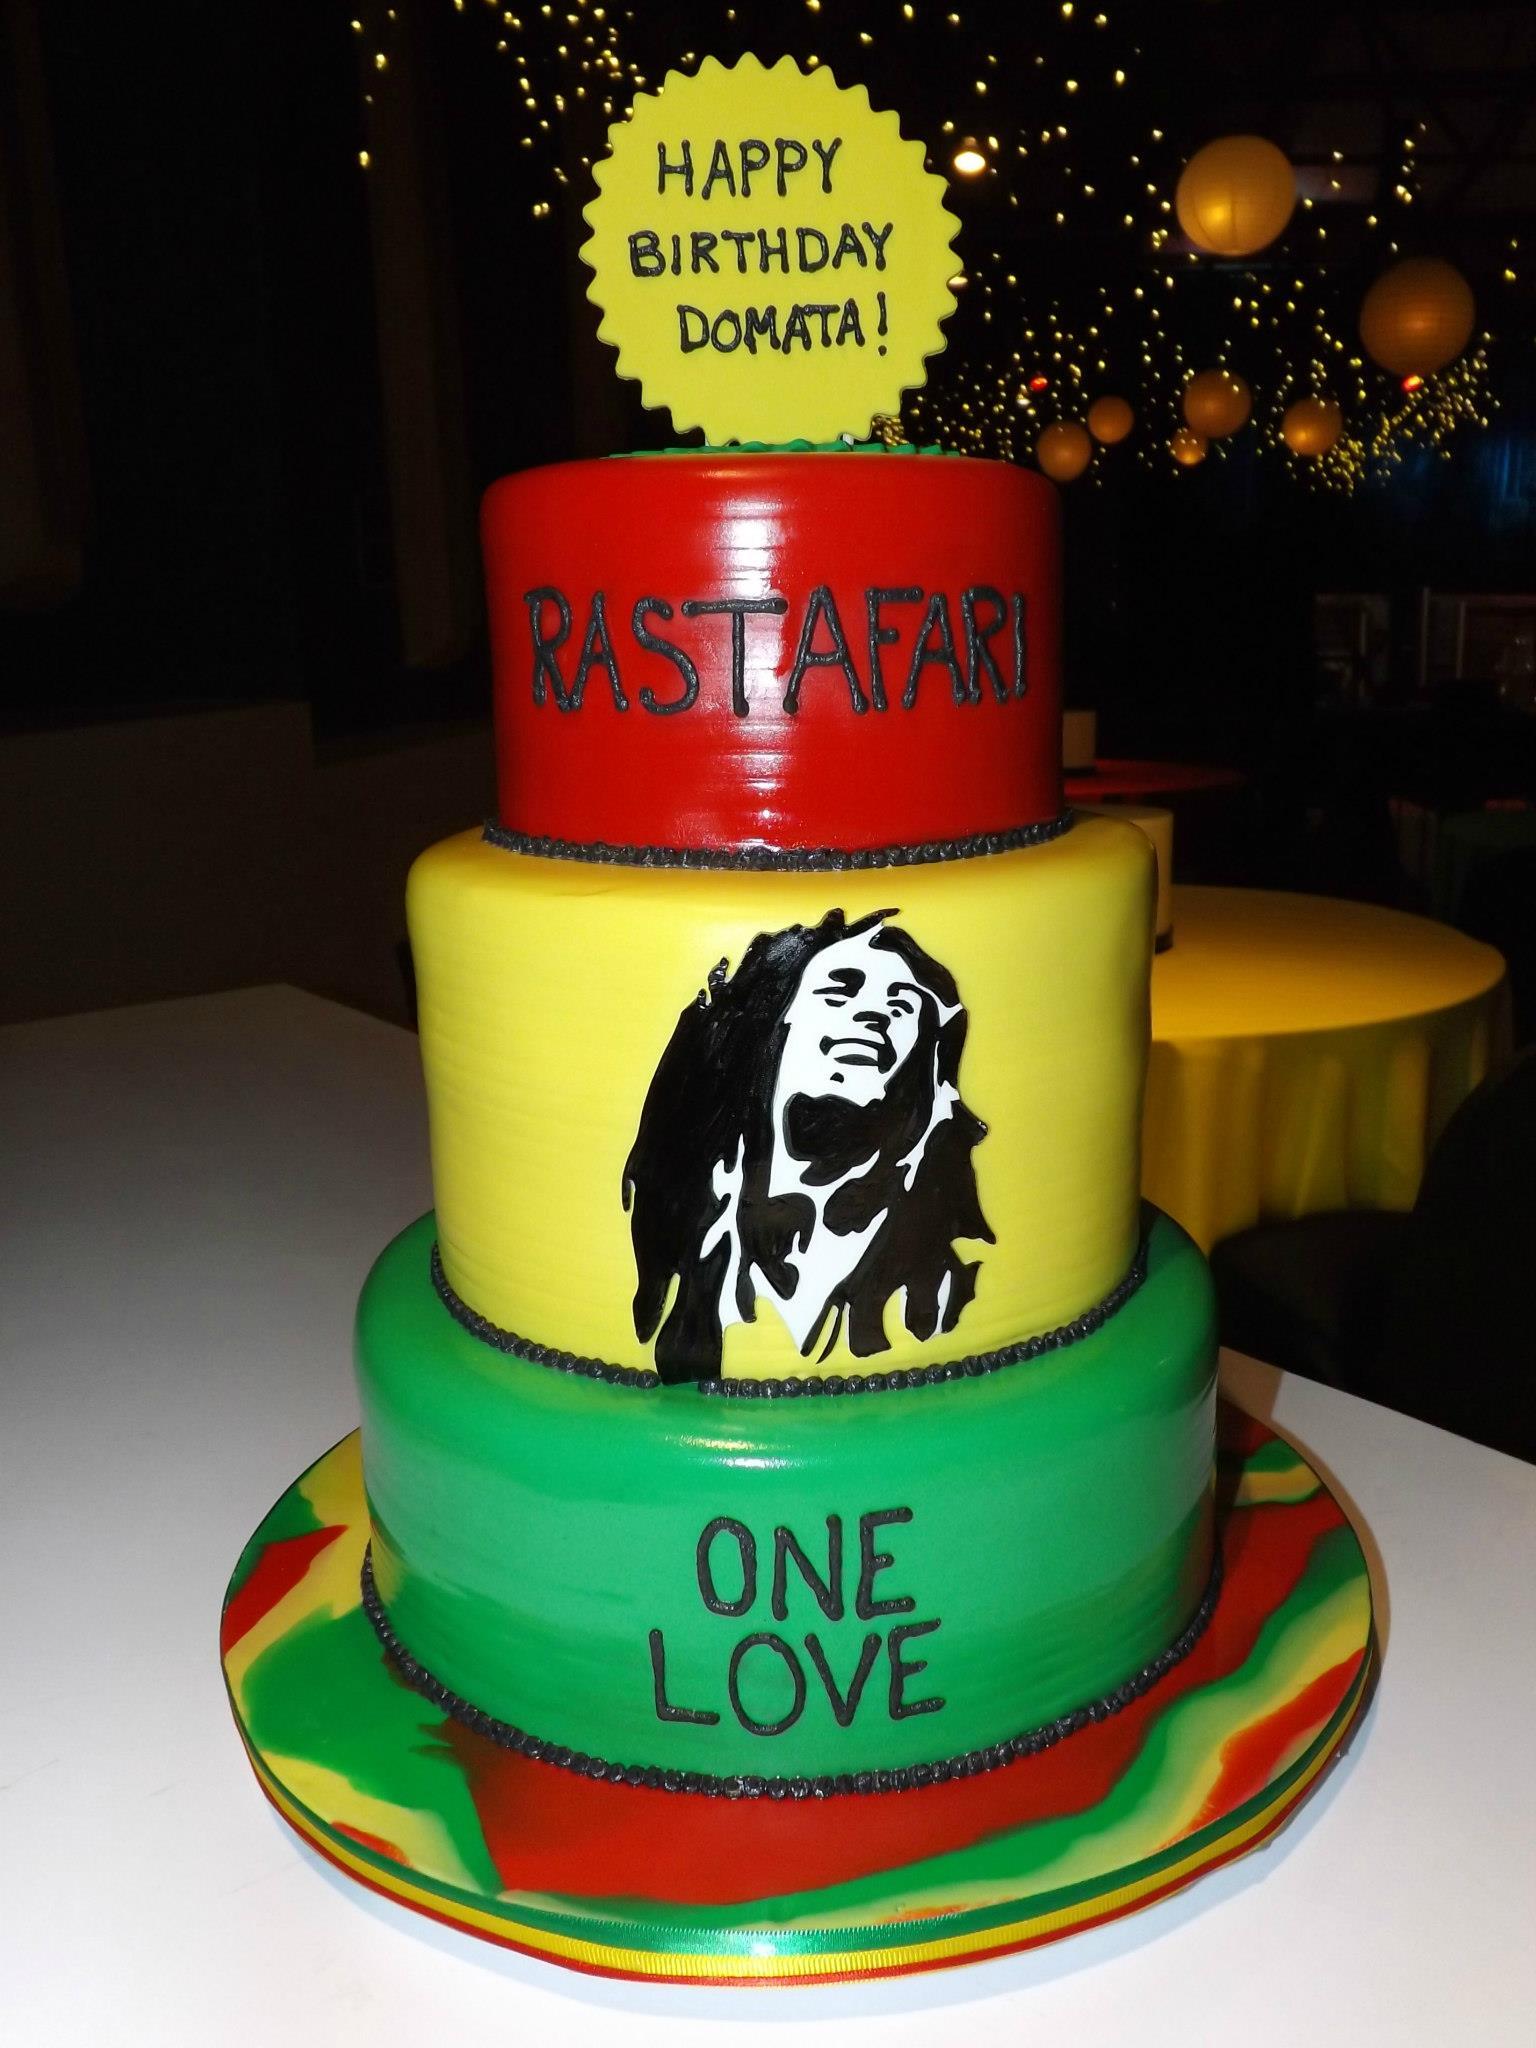 Miraculous 12 Rasta Themed Birthday Cakes Photo Bob Marley Birthday Cake Funny Birthday Cards Online Elaedamsfinfo